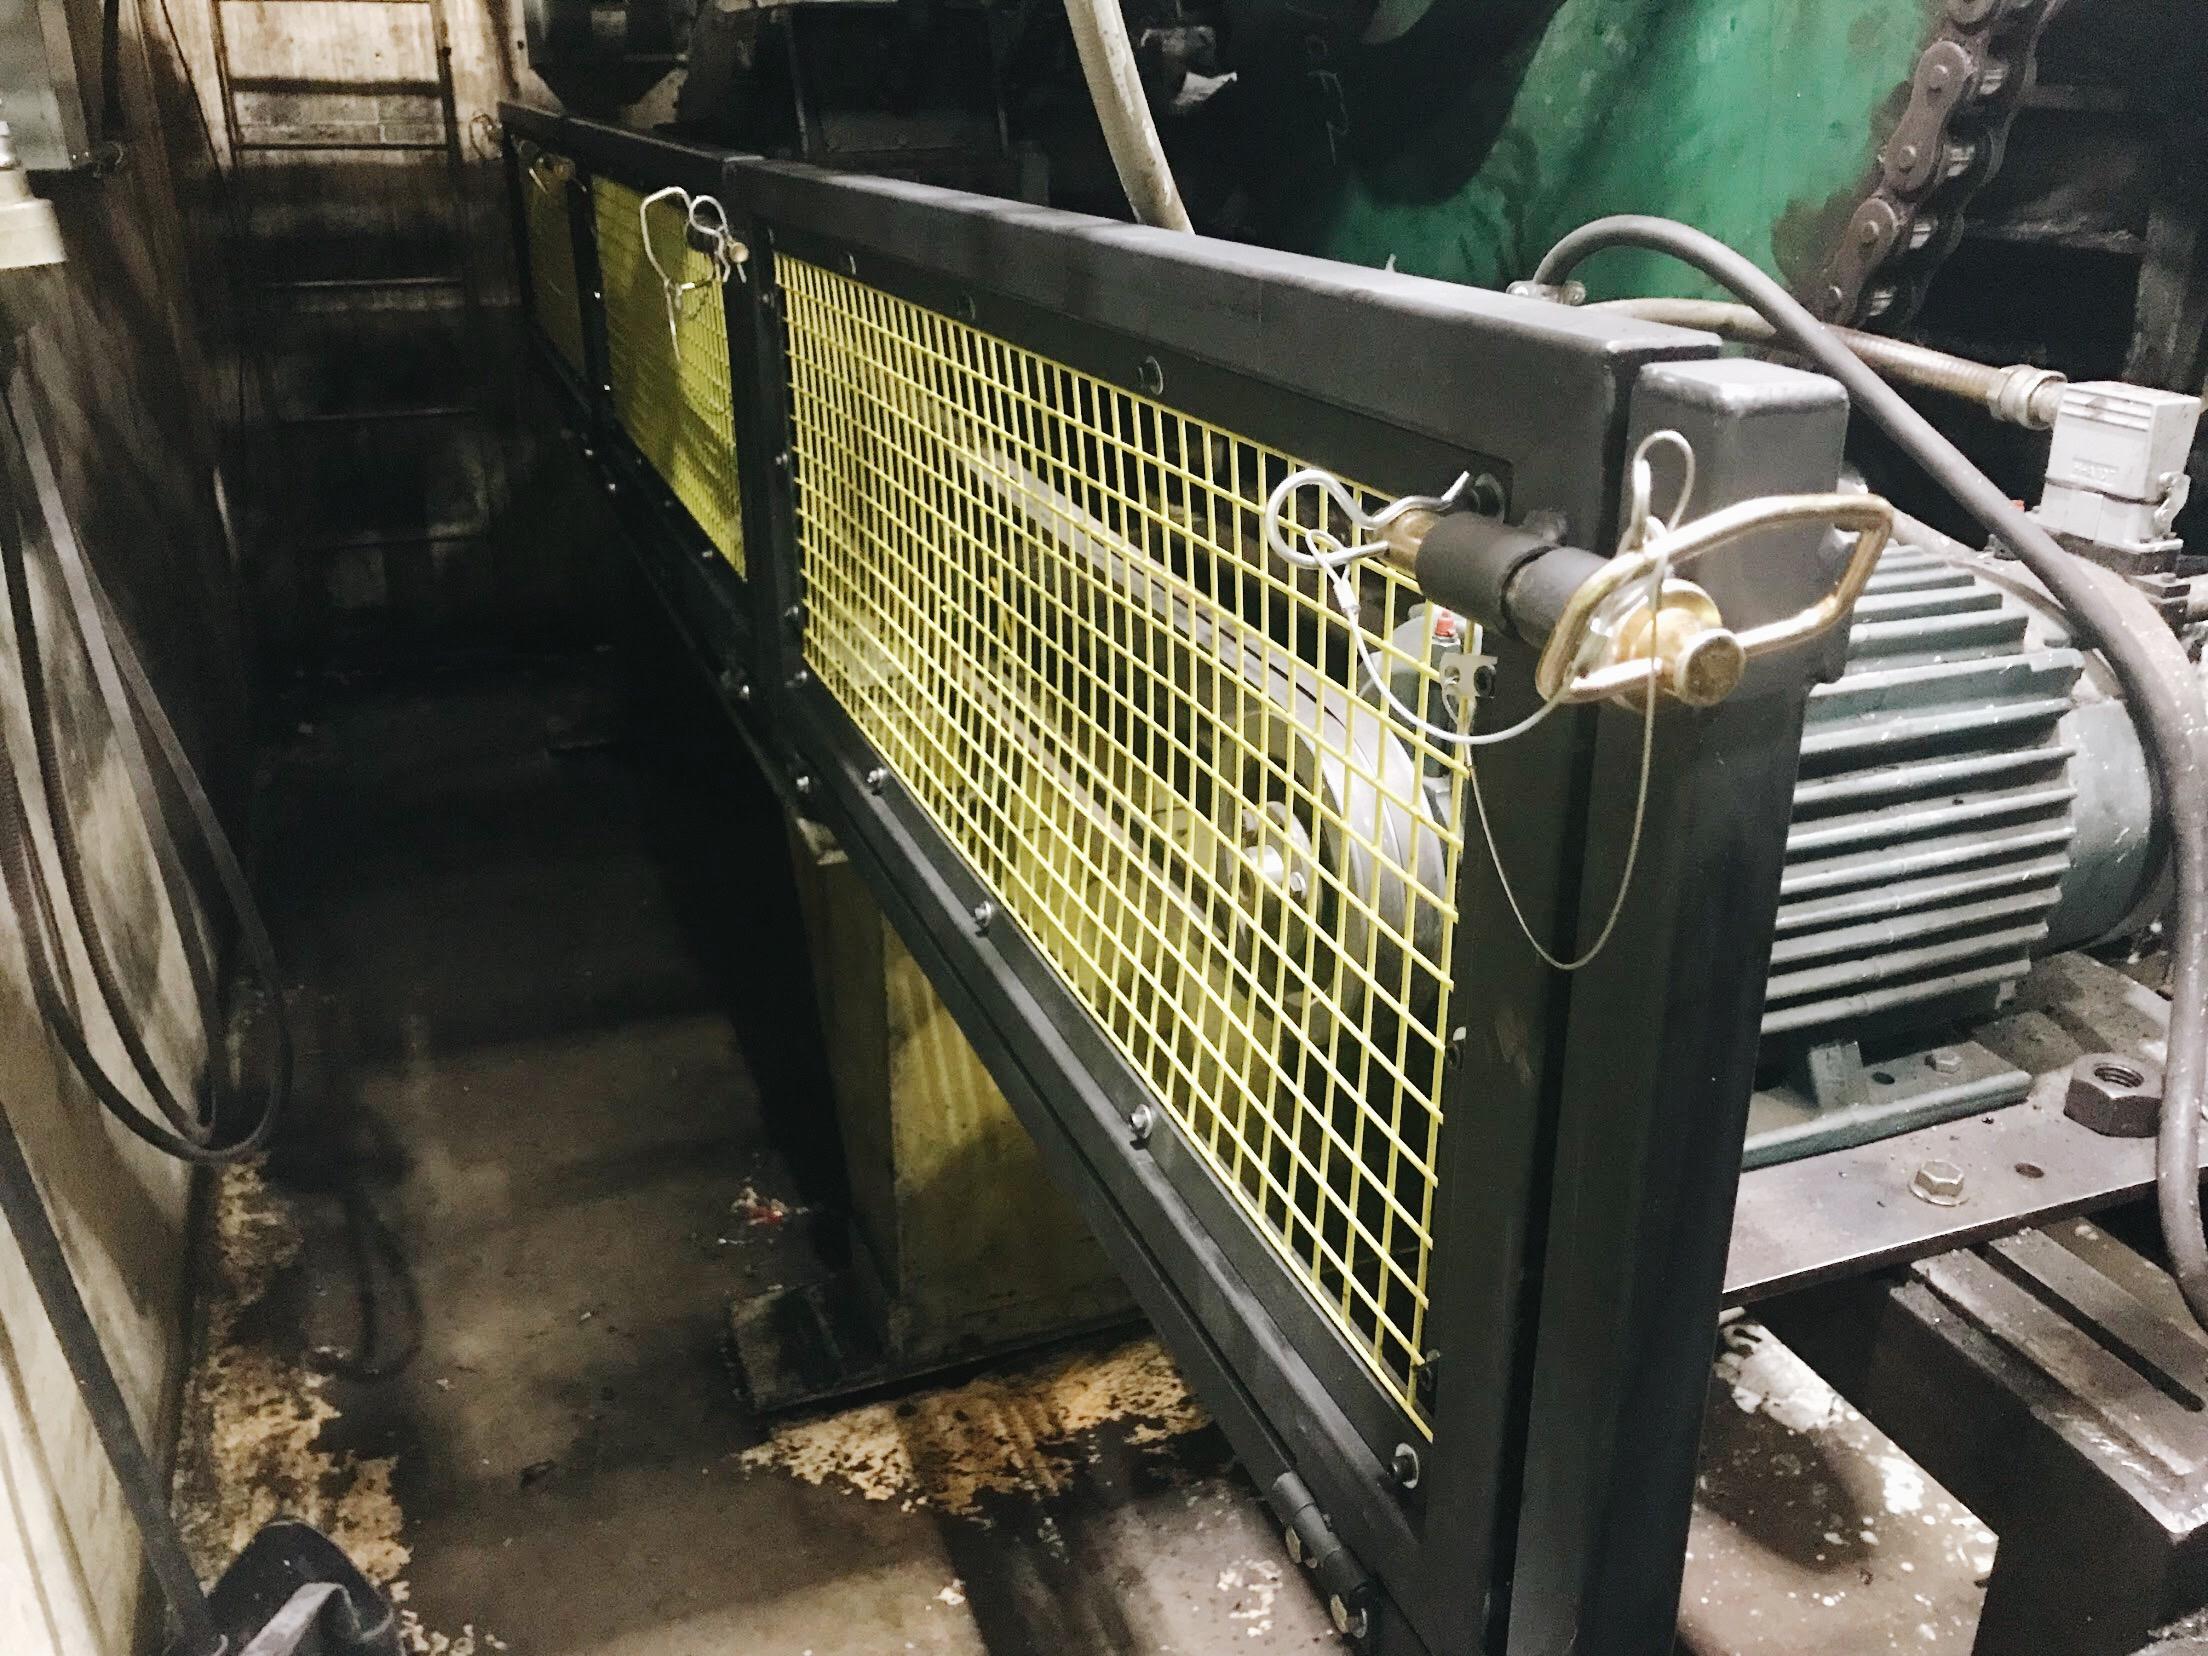 fabrication texas industrial machine & design 2.jpg